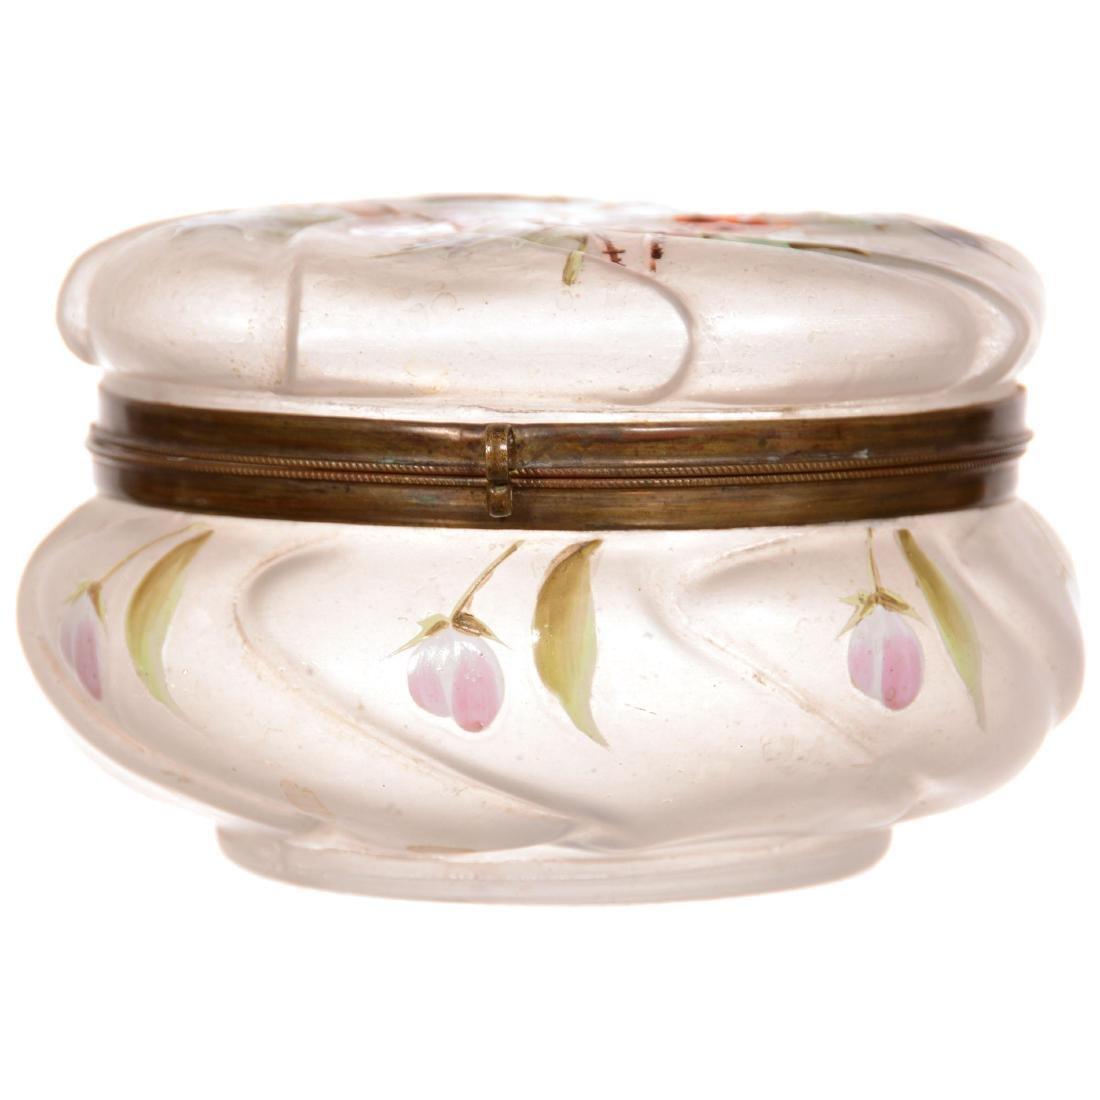 Unmarked Wavecrest Style Round Hinged Jewel Box